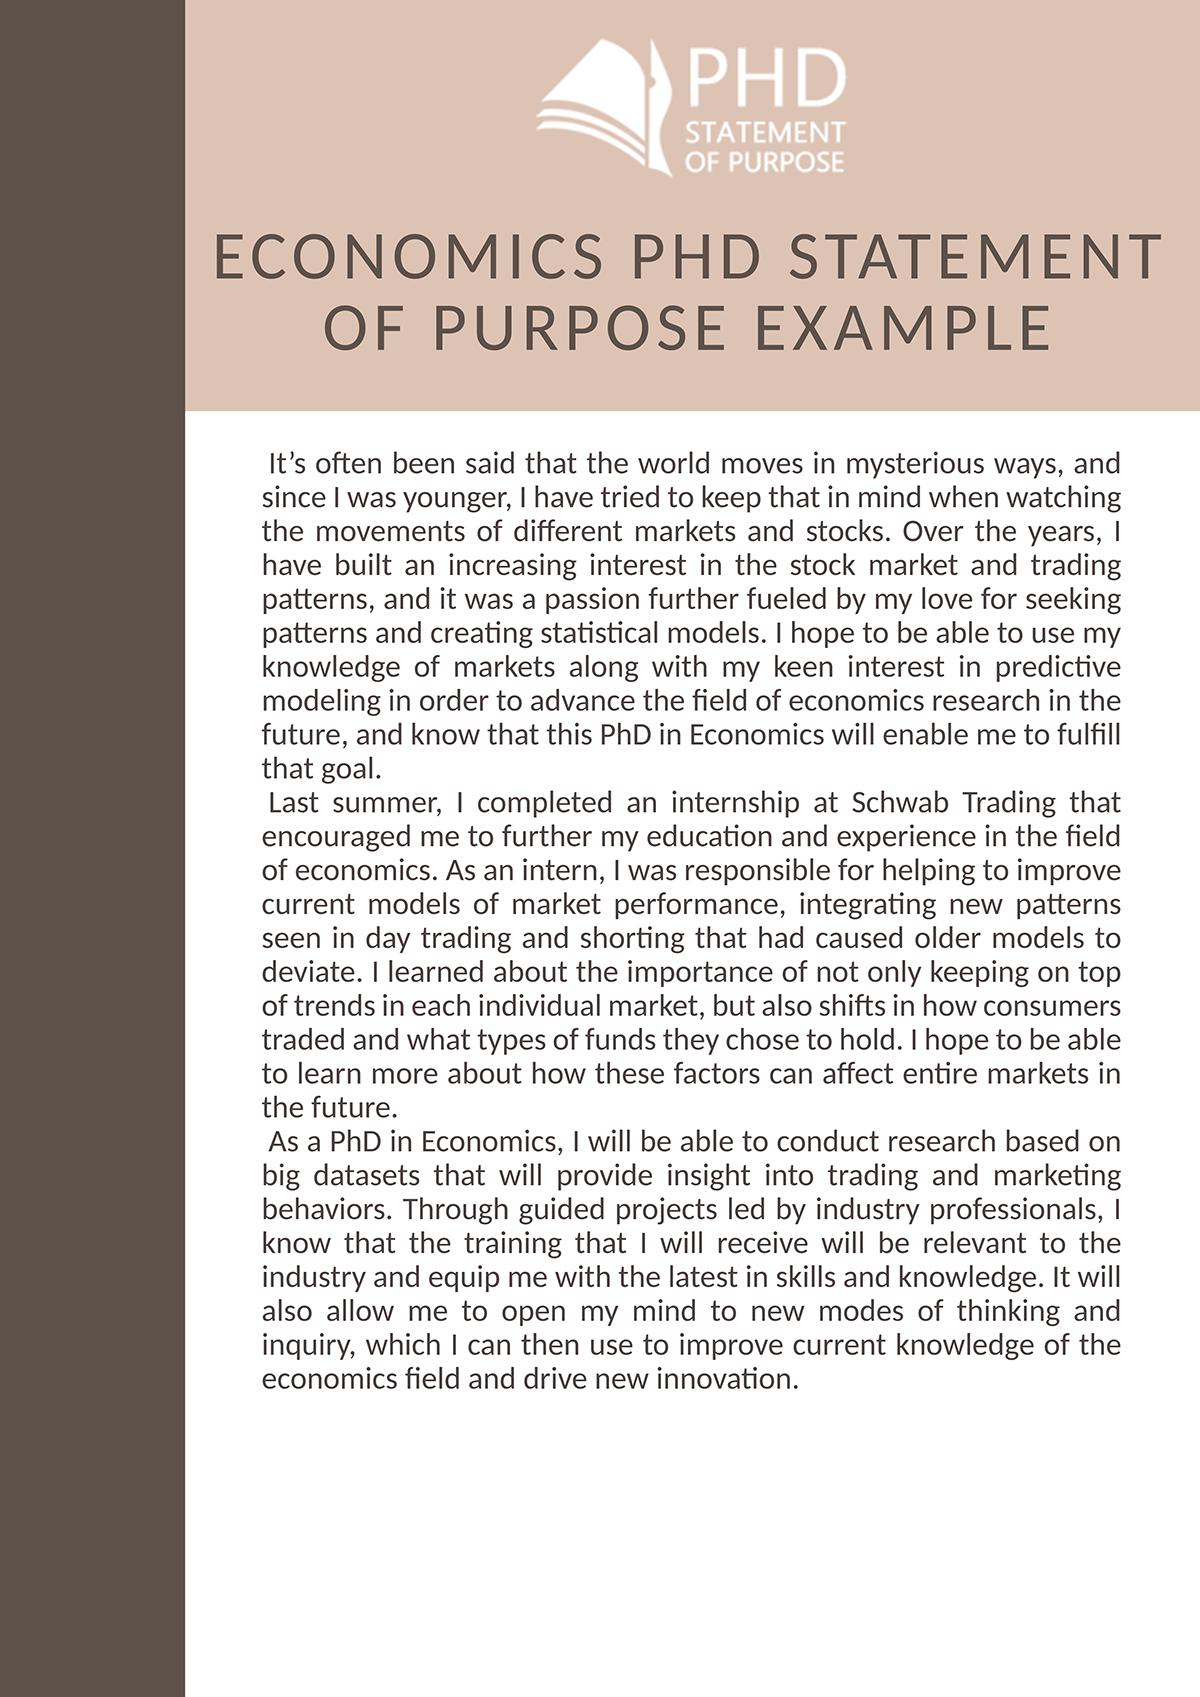 Economics PhD Statement of Purpose Example on Pantone Canvas